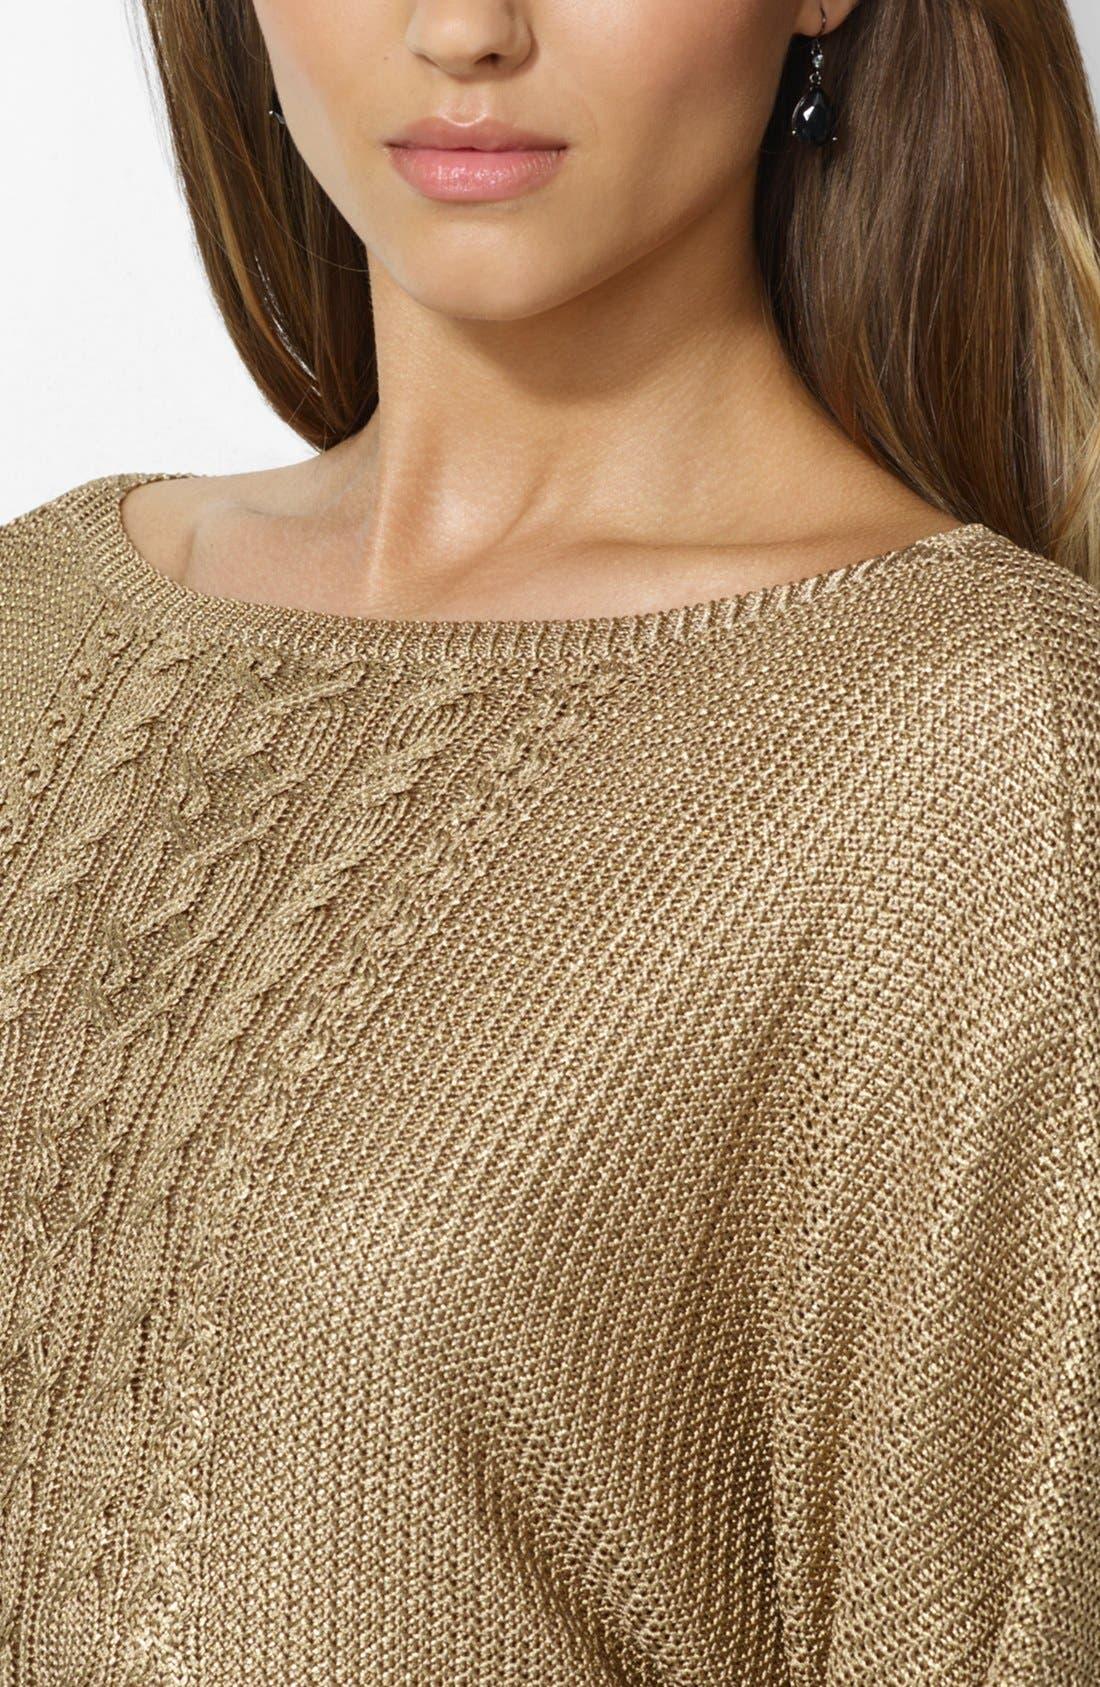 Alternate Image 3  - Lauren Ralph Lauren Bateau Neck Sweater